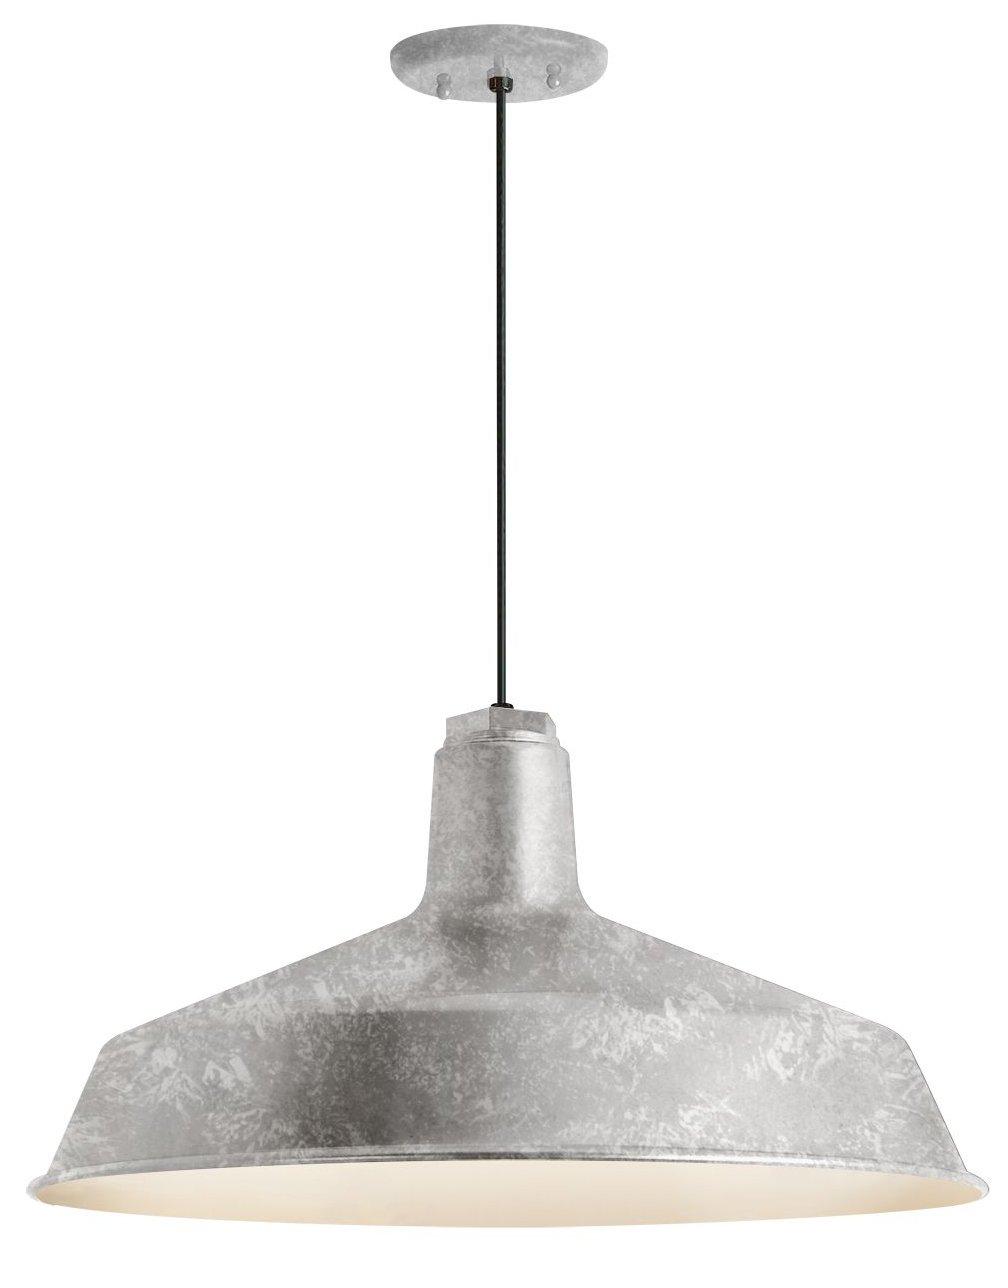 Jeffries 1 Light Dome Pendant Inside Gattis 1 Light Dome Pendants (View 16 of 30)